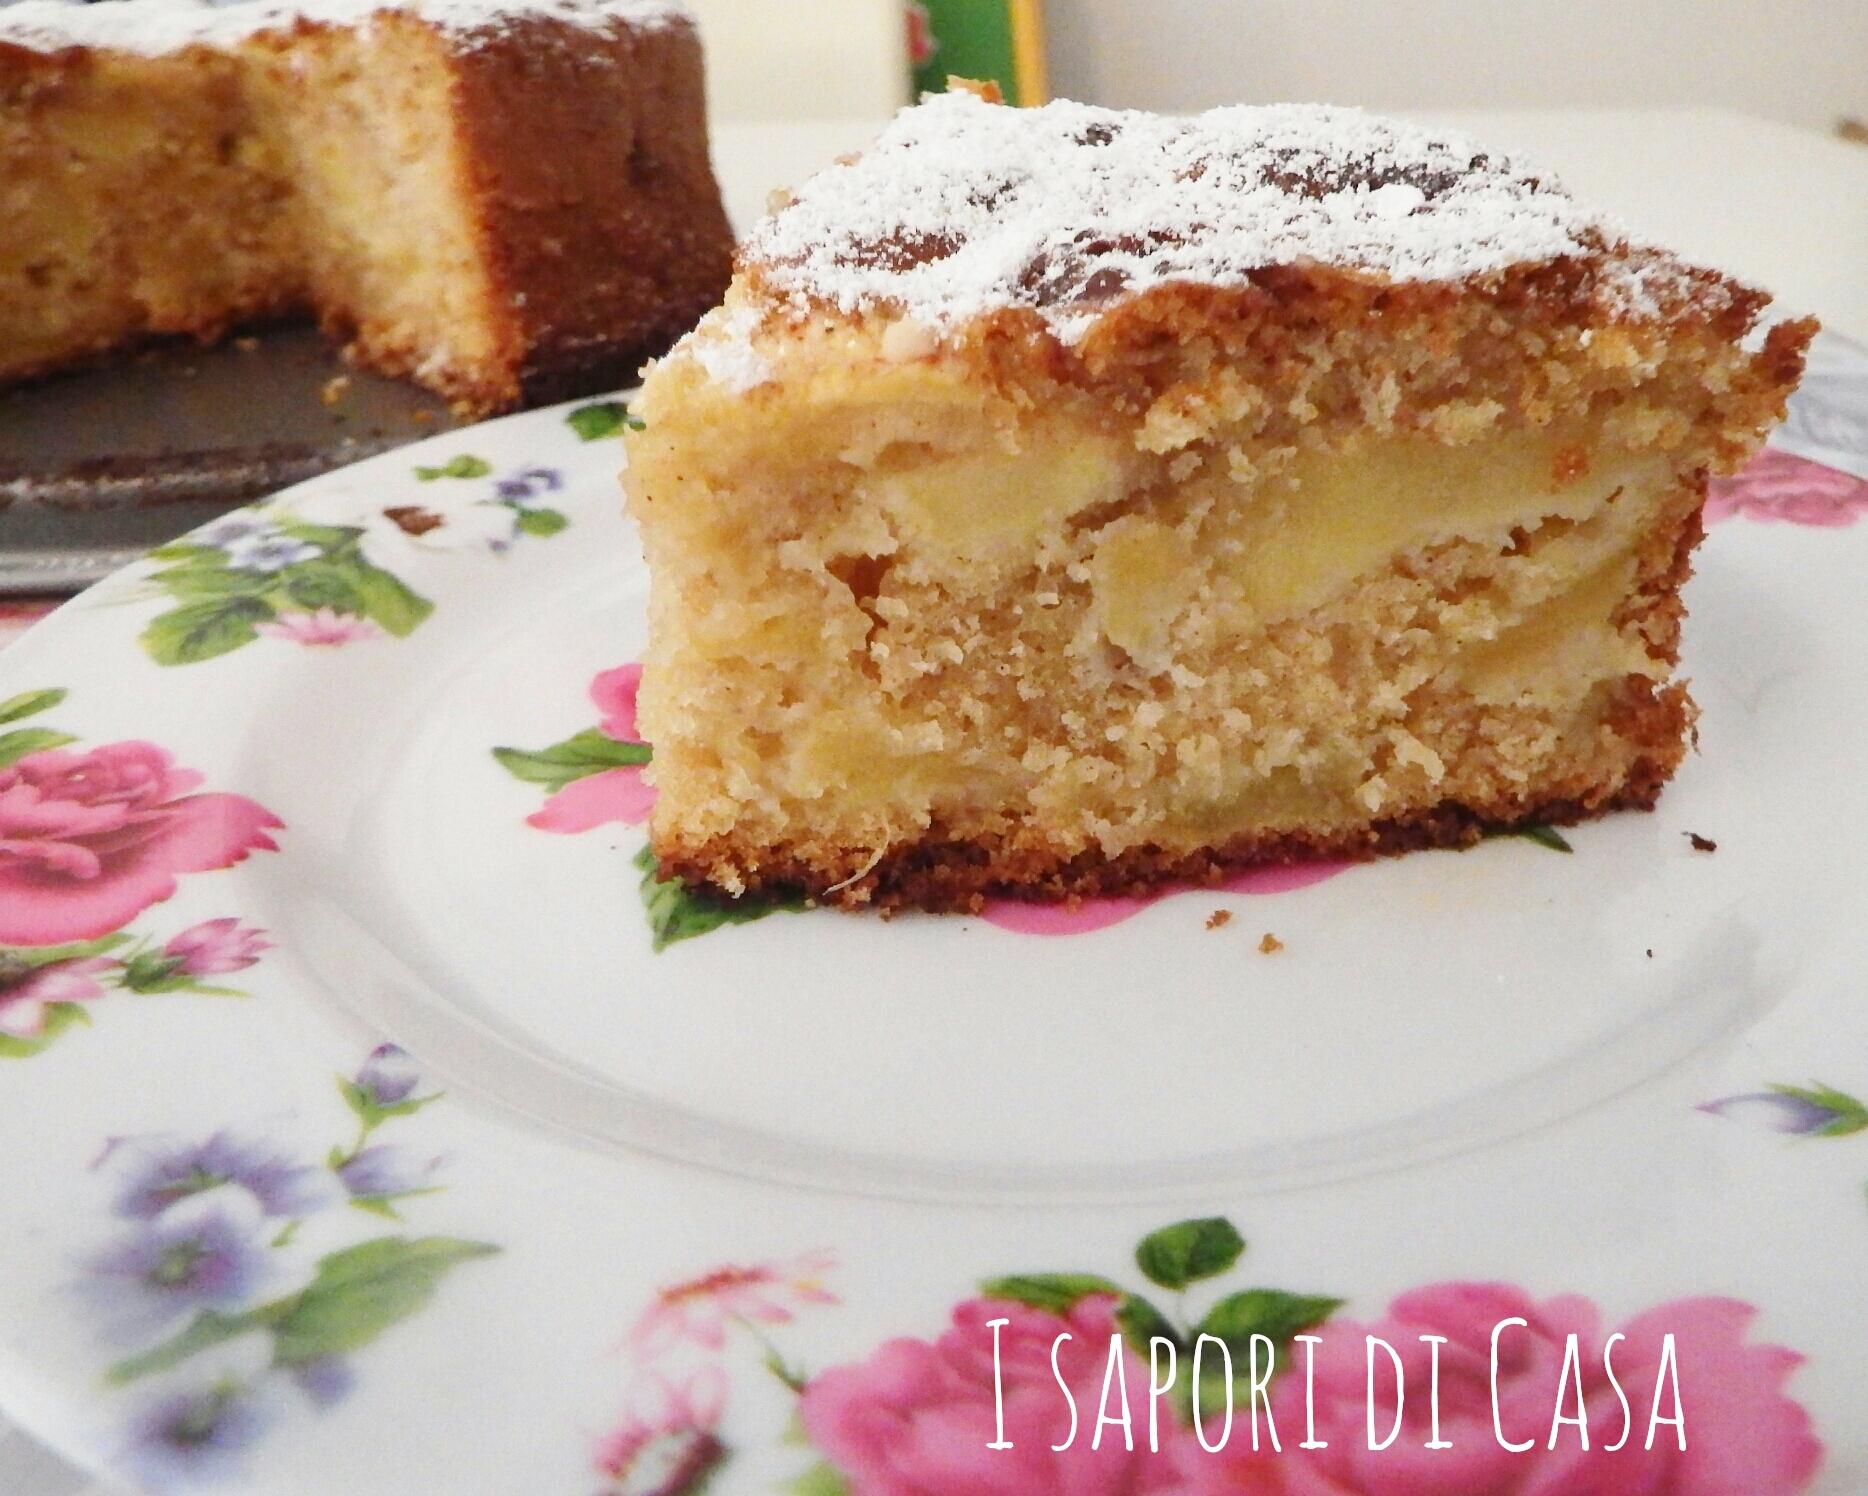 Cake alle mele caramellate e cannella